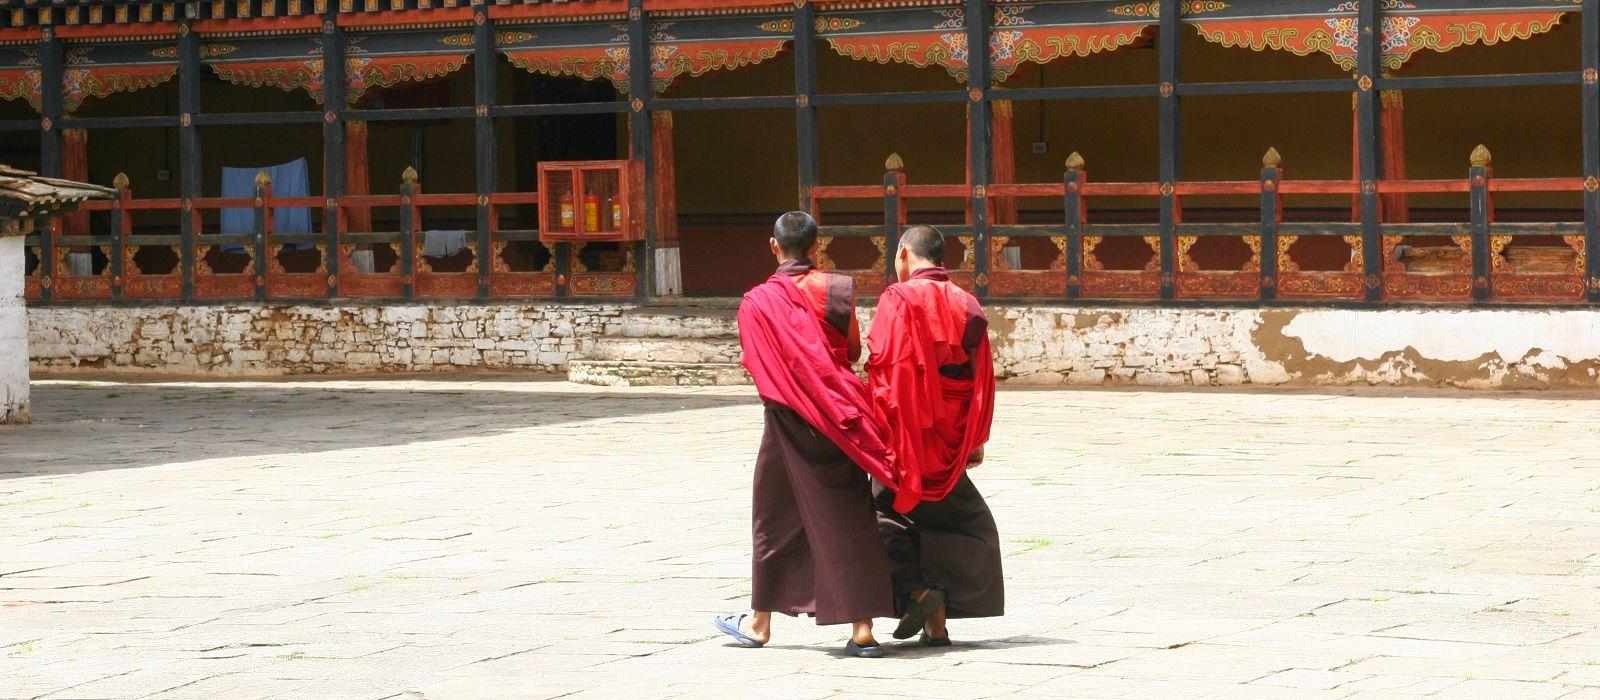 Highlights der Himalayas: Nepal, Bhutan und Tibet Urlaub 4